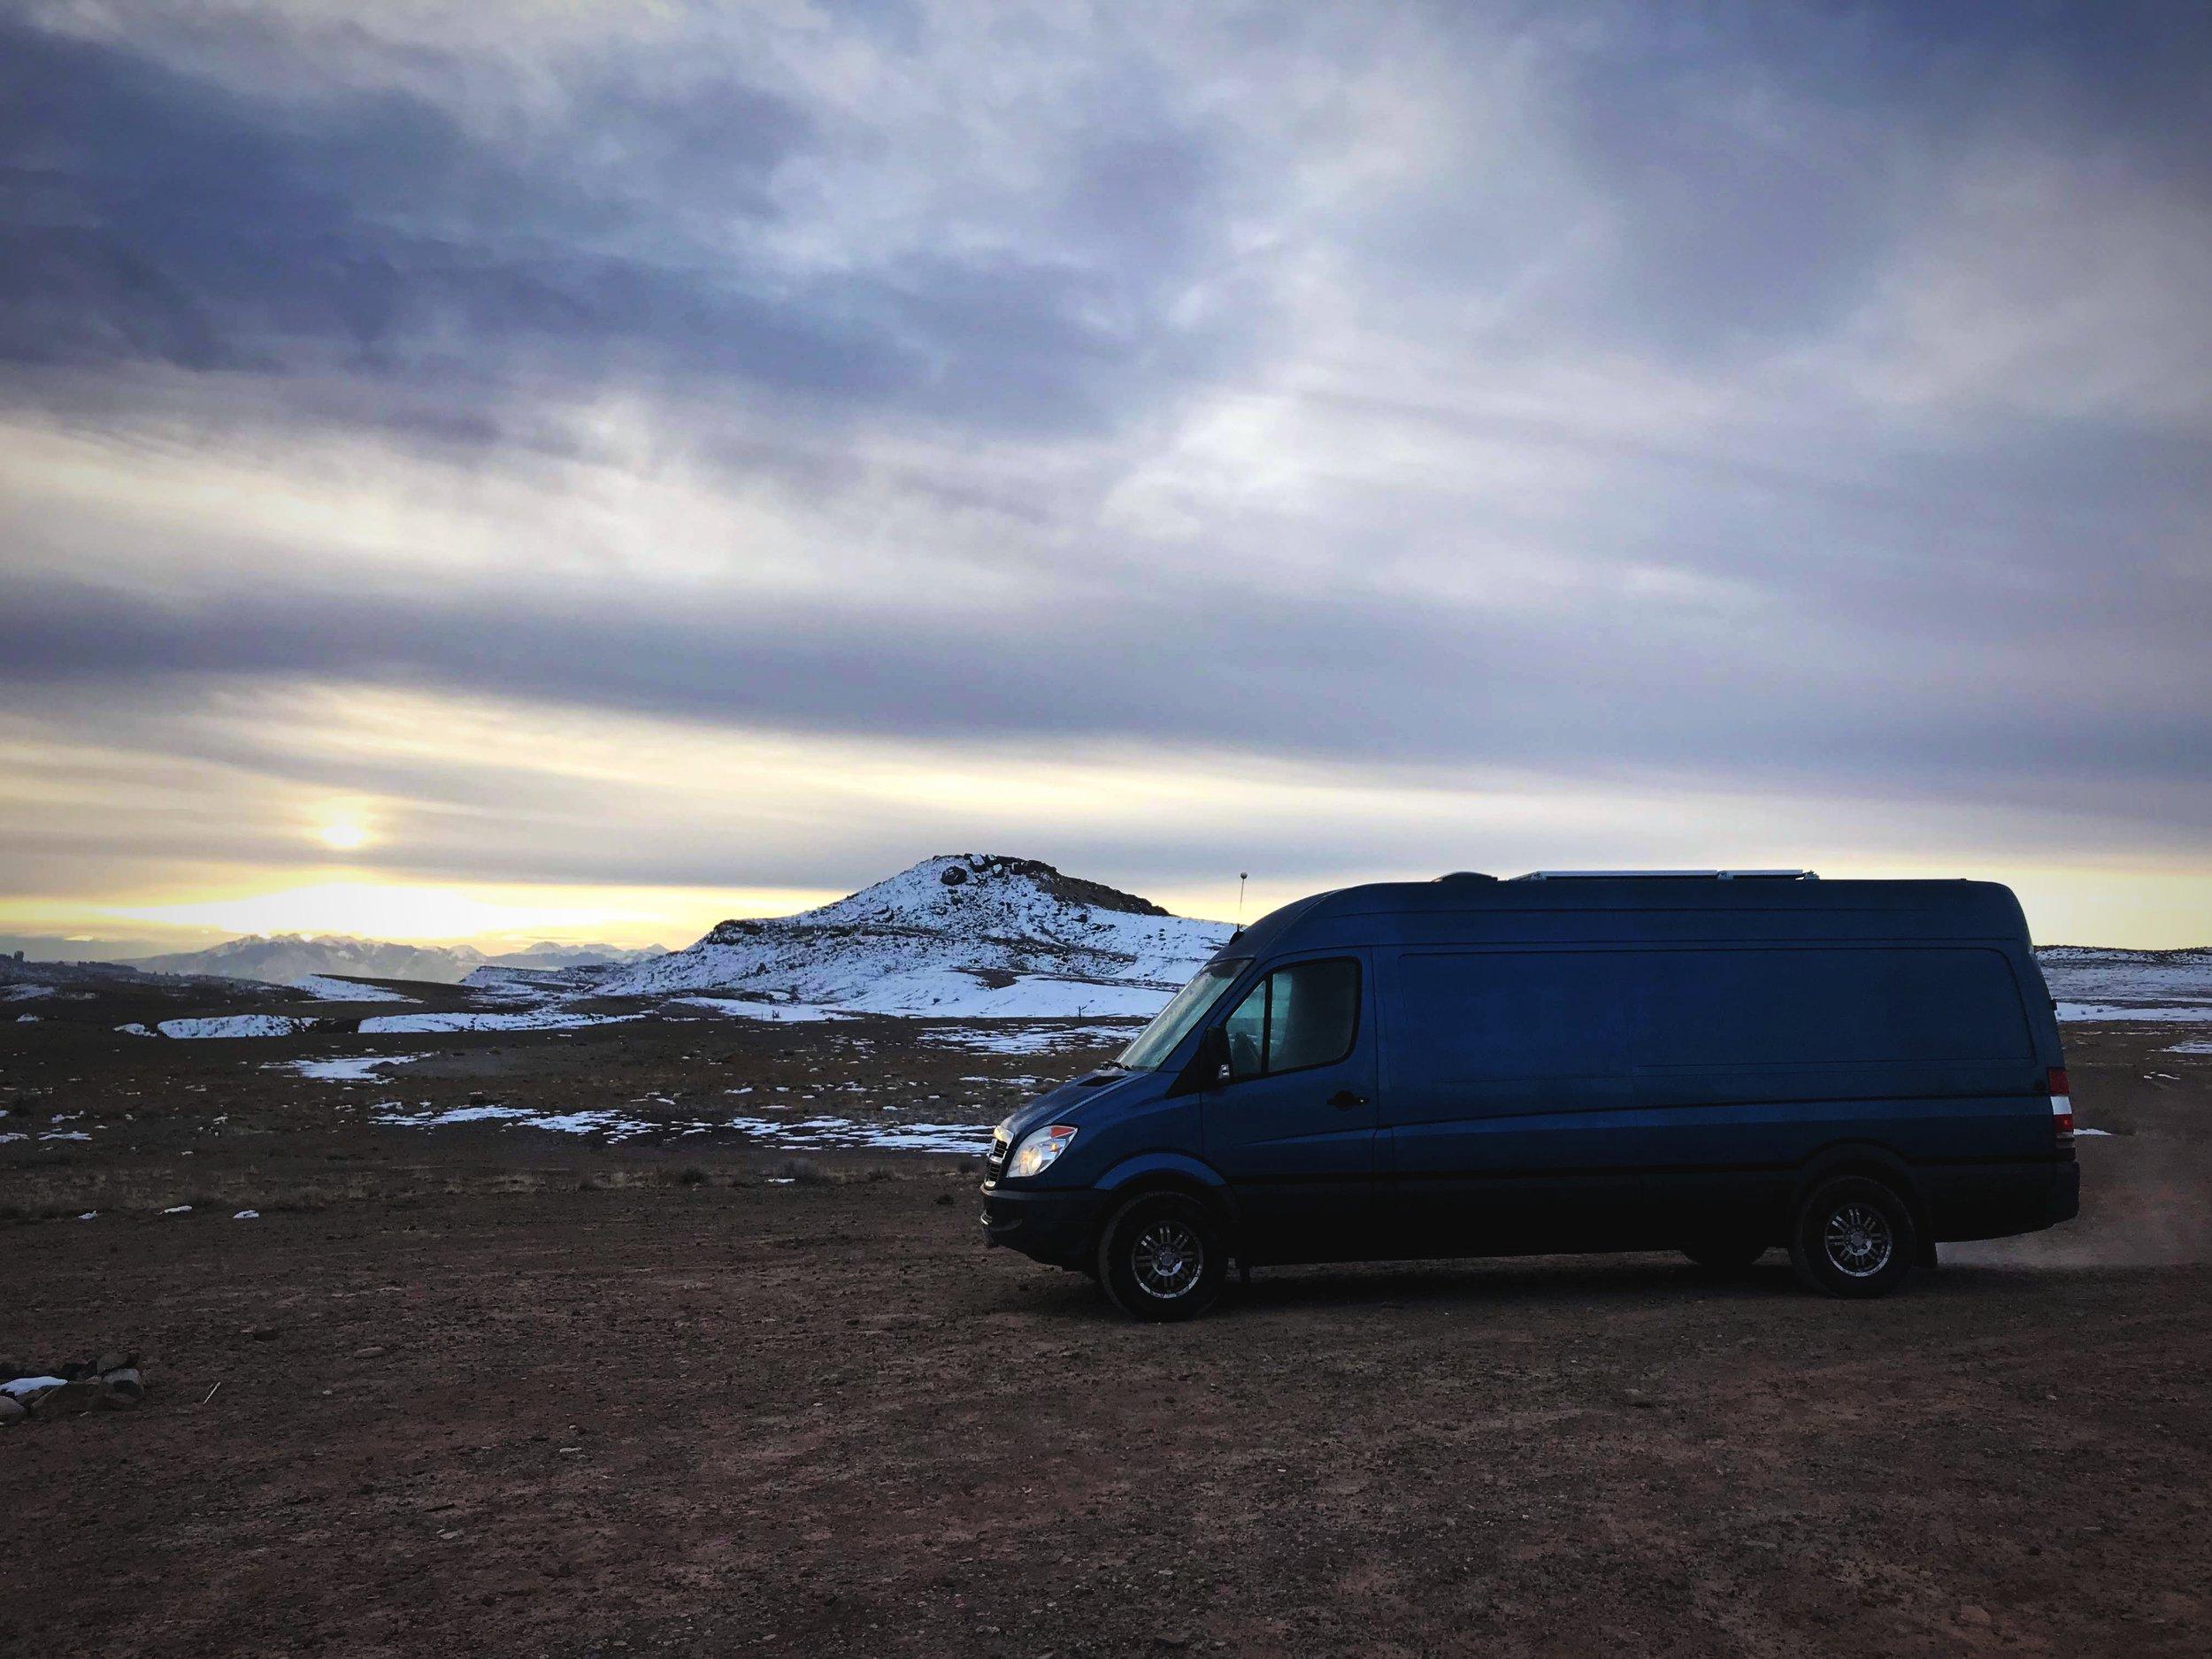 Free campsite at Klondike Trails—an open, quiet area.